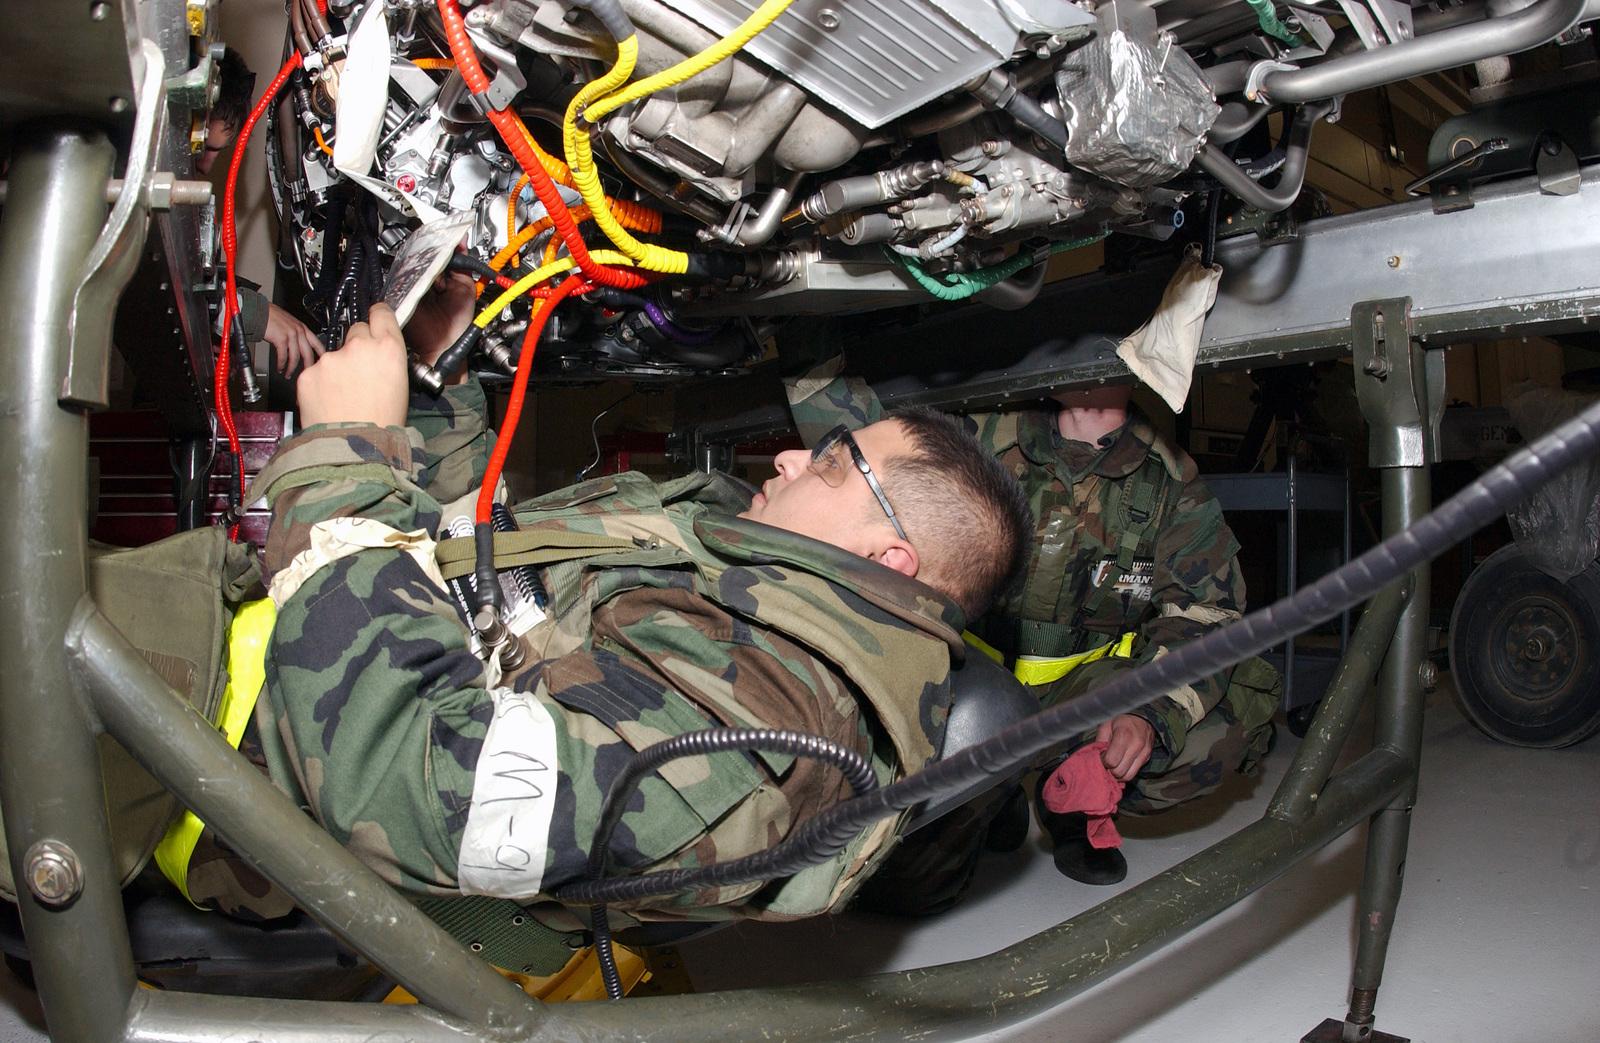 U.S. Air Force SENIOR AIRMAN Felipe Venegas, 354th ... F Aircraft Wiring Harness on